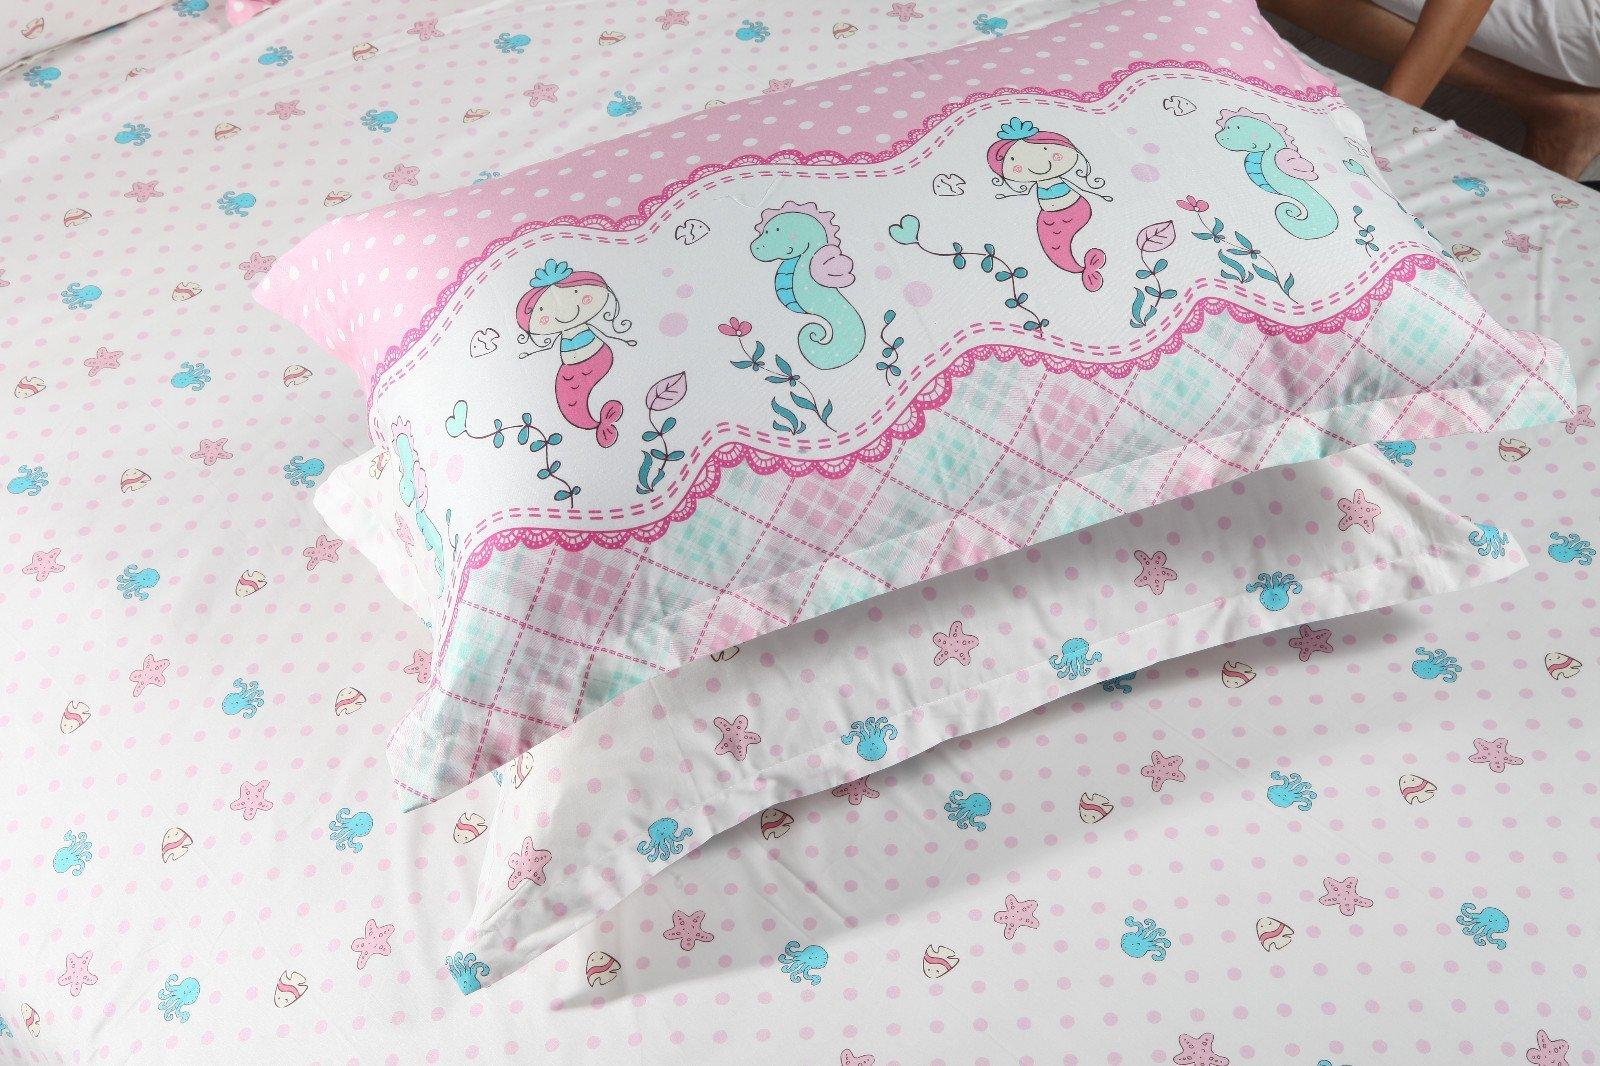 Adorable Mermaids Bedding Sheet Set Pure Cotton   #6818